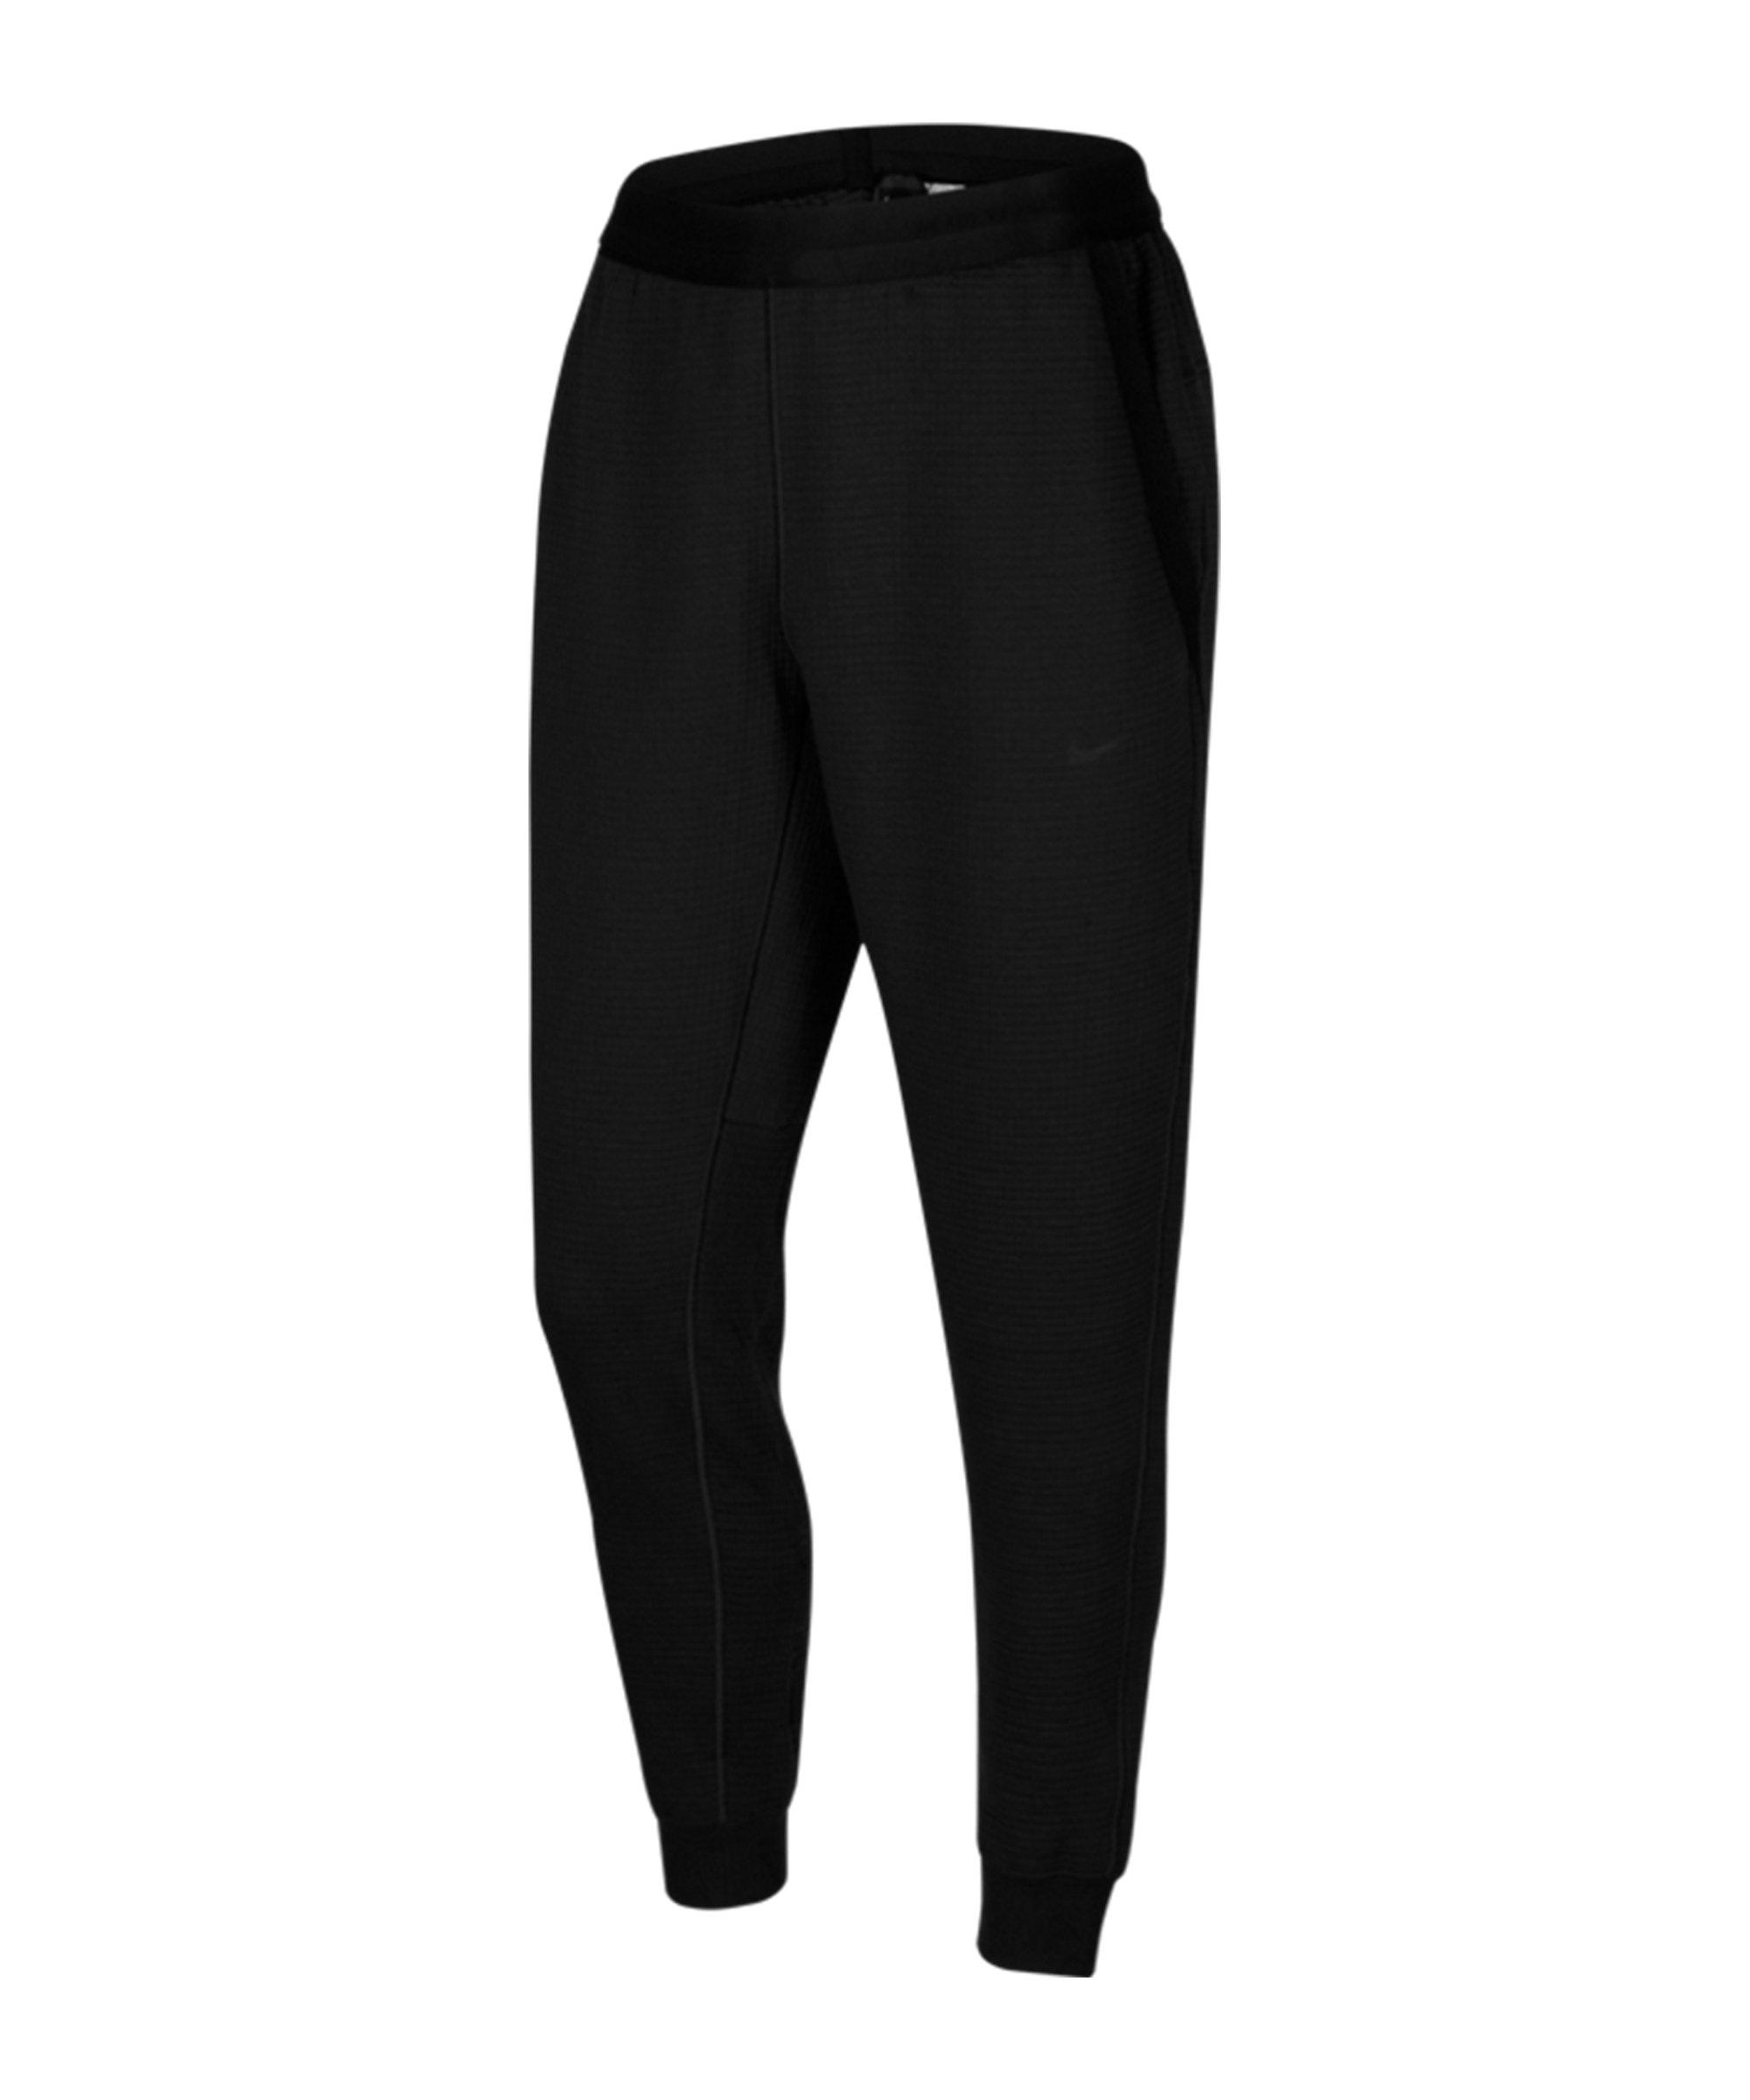 Nike Tech Pack Jogginghose Schwarz Grün F014 - schwarz